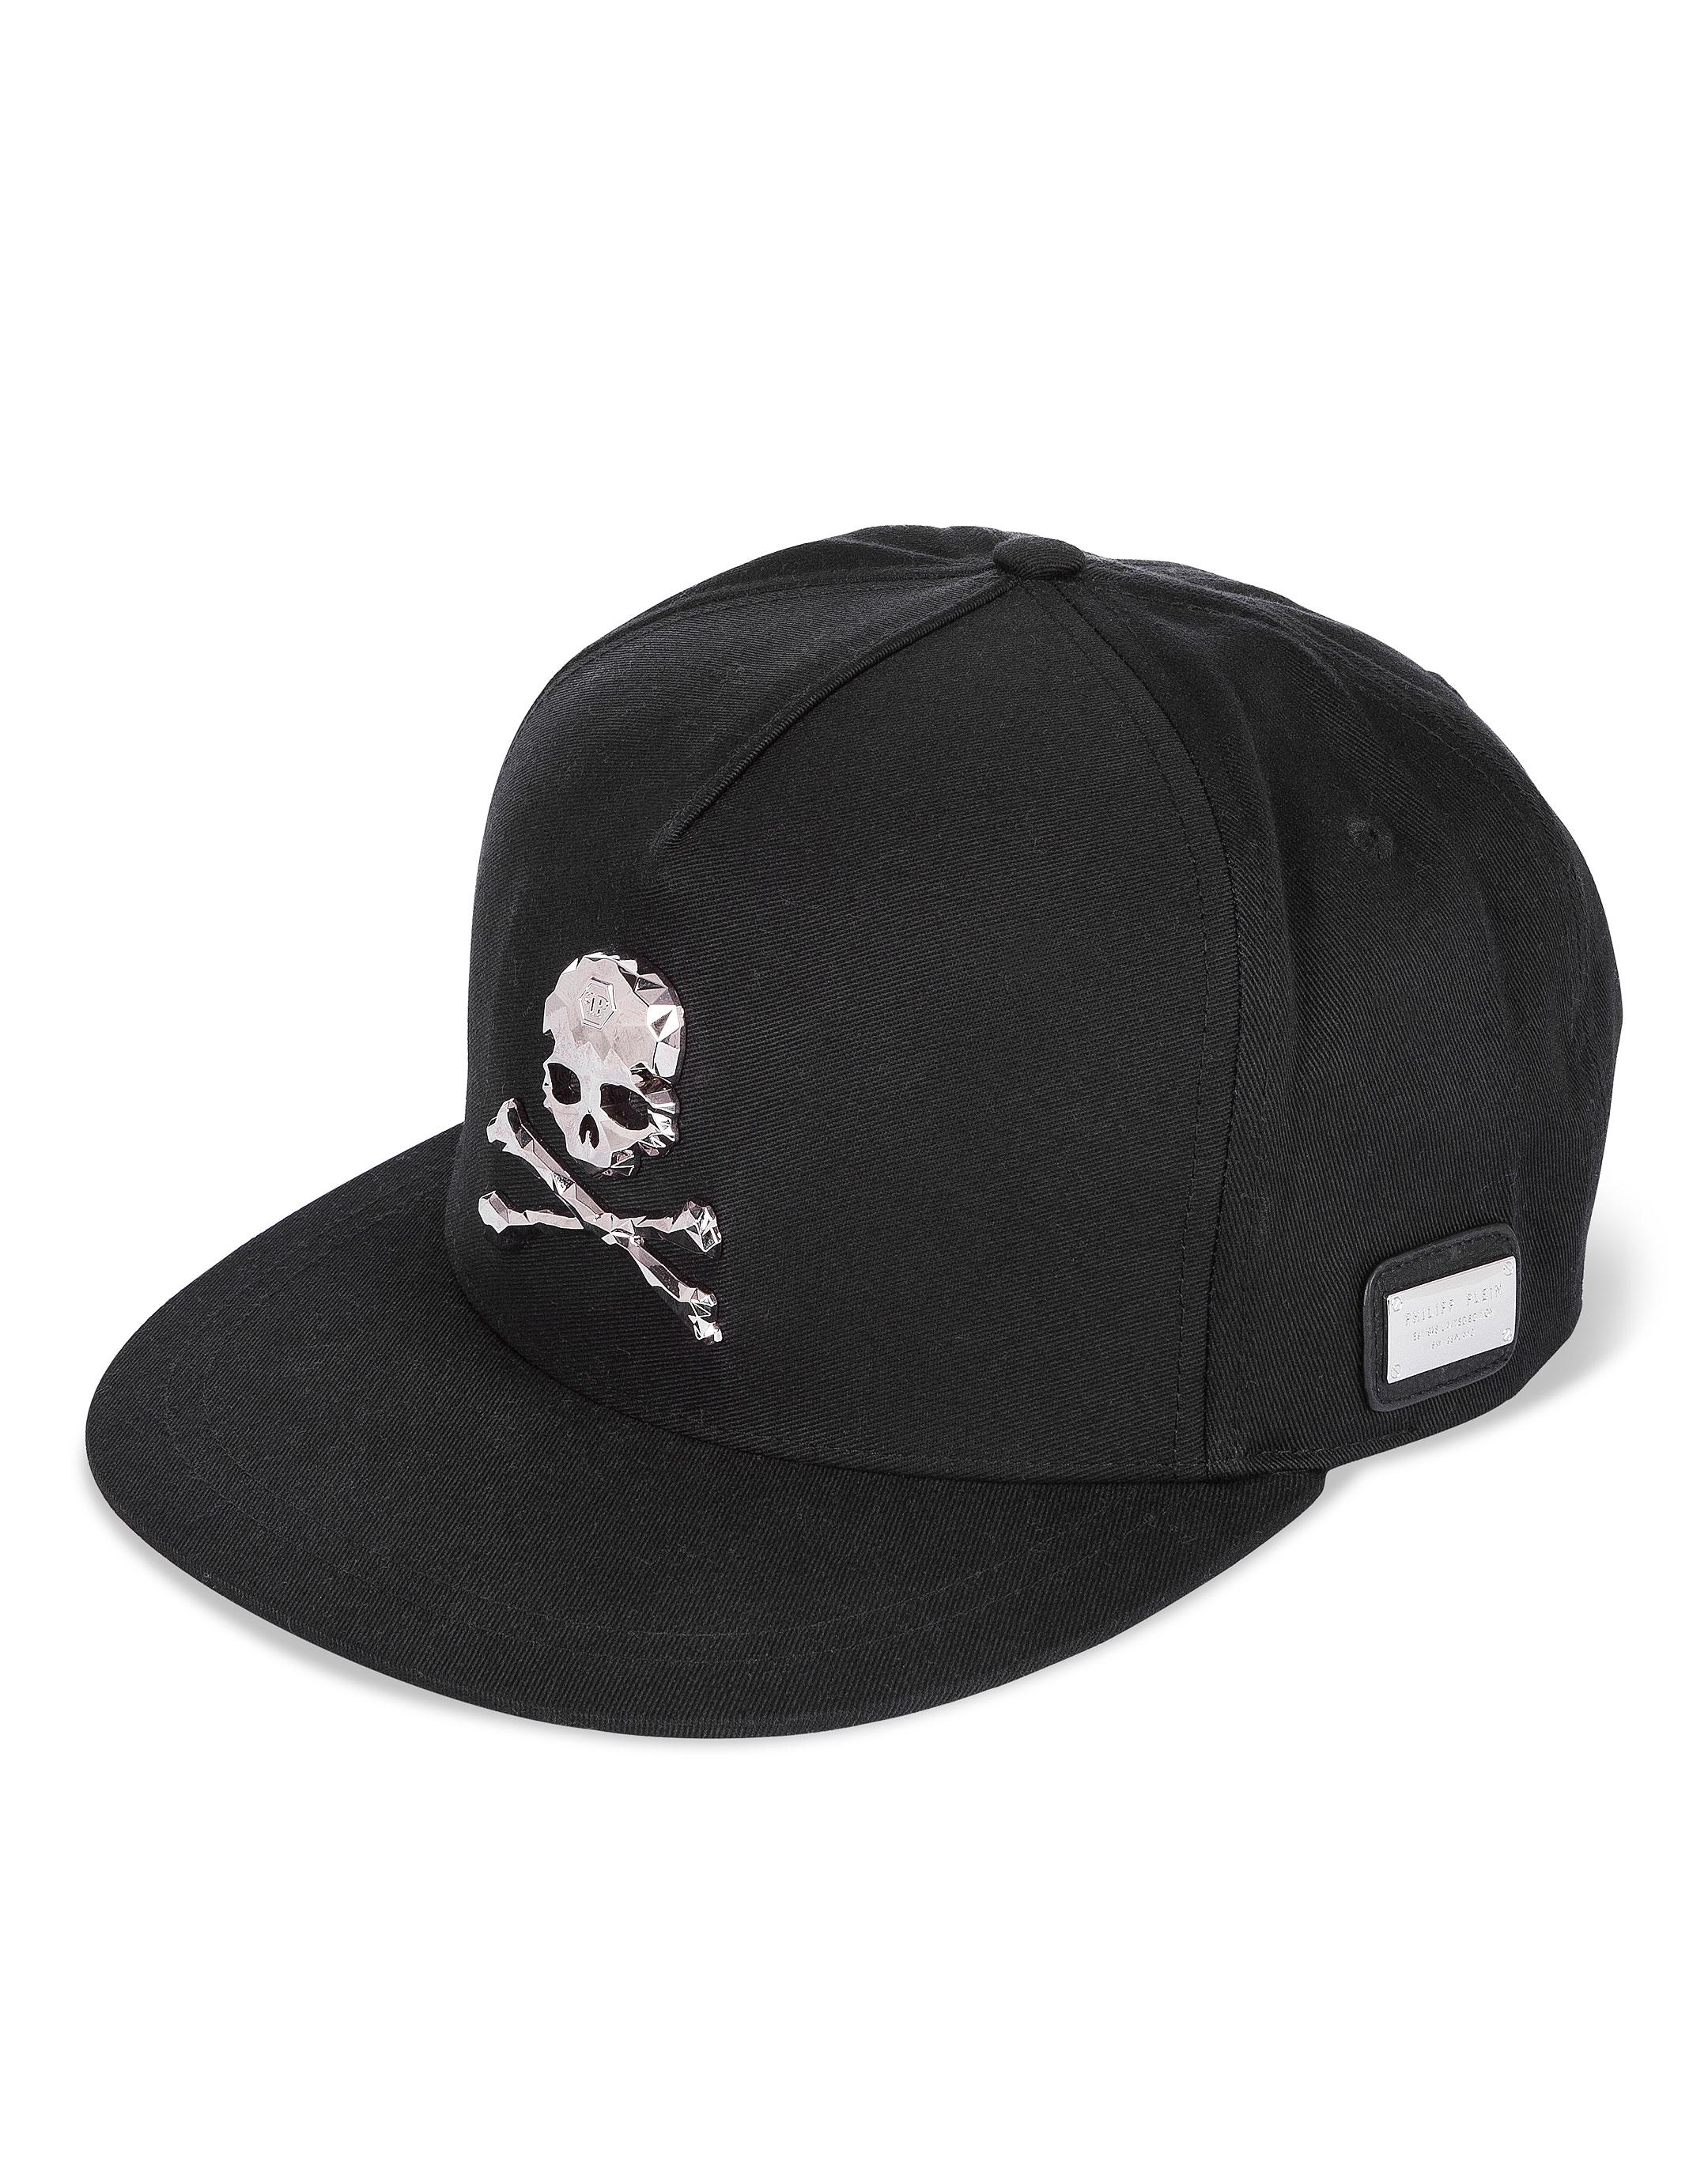 609cdab0758 Baseball Cap